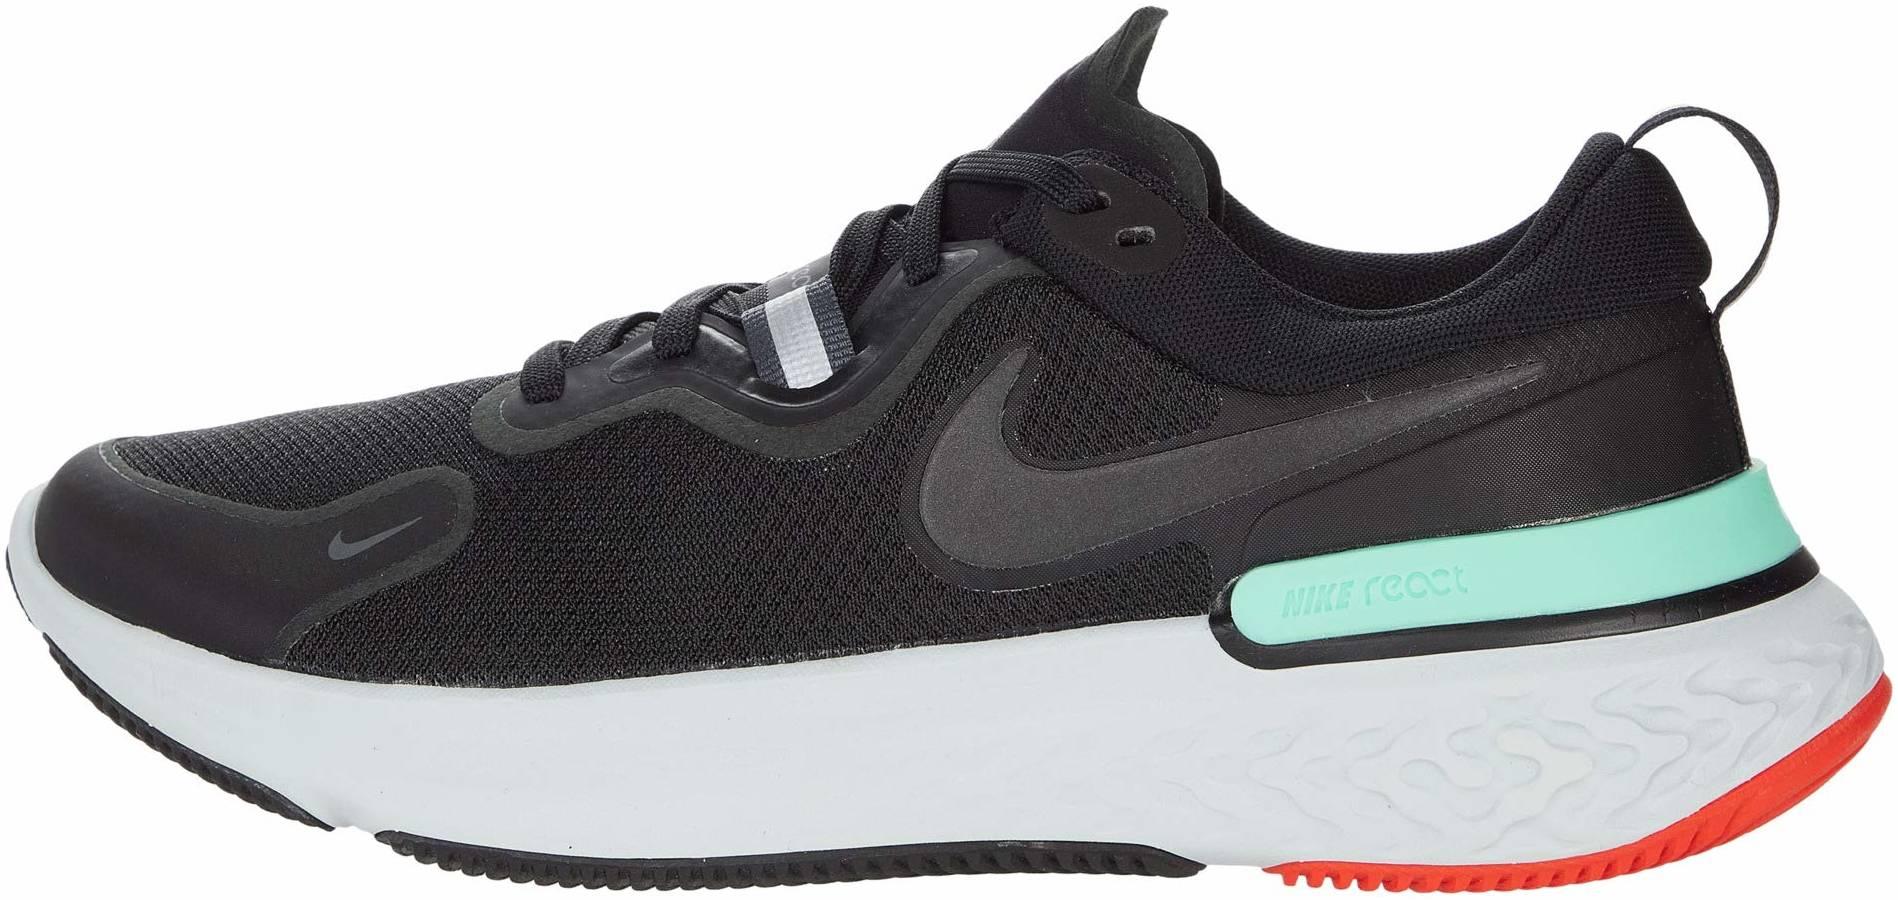 Nike React Miler - Review 2021 - Facts, Deals ($51)   RunRepeat